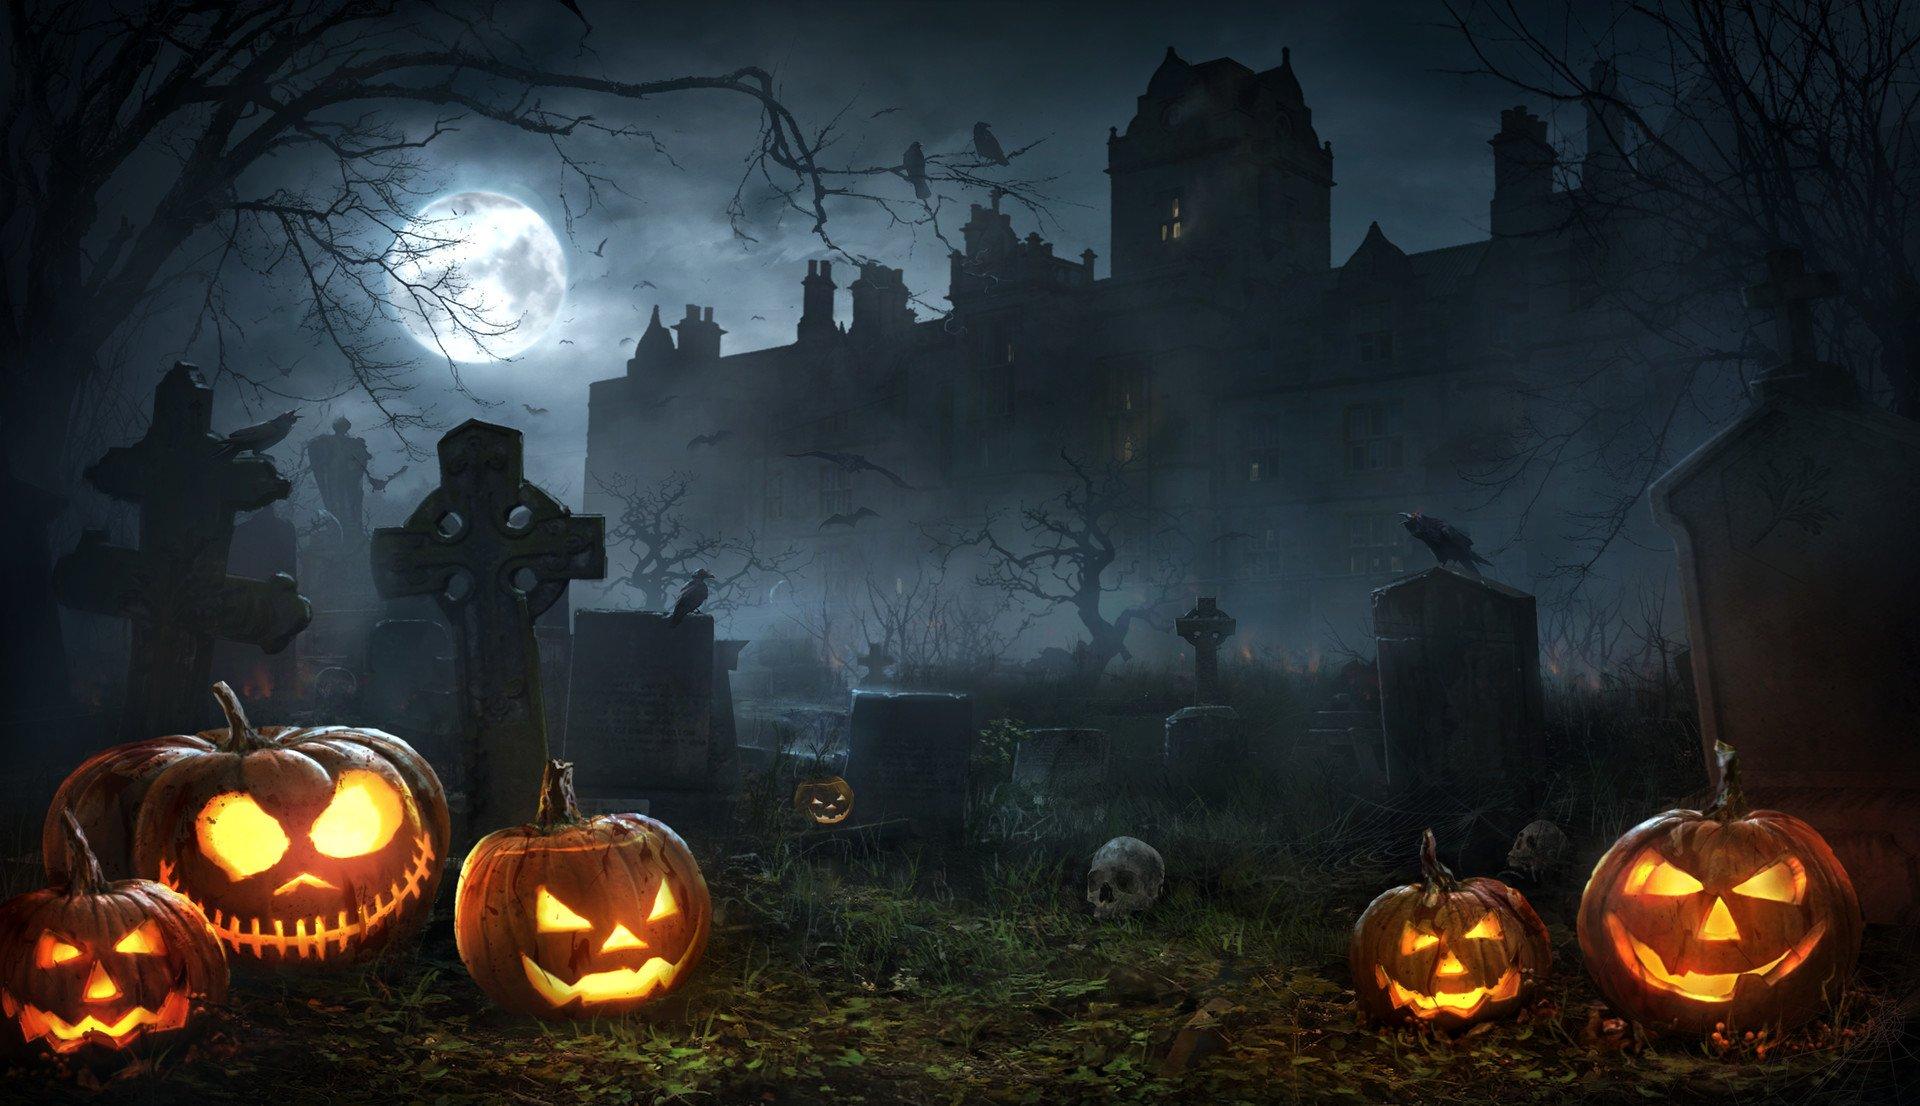 Halloween Wallpapers Hd-3 - Halloween Night Wallpaper Hd - 1920x1106 - Download HD Wallpaper - WallpaperTip